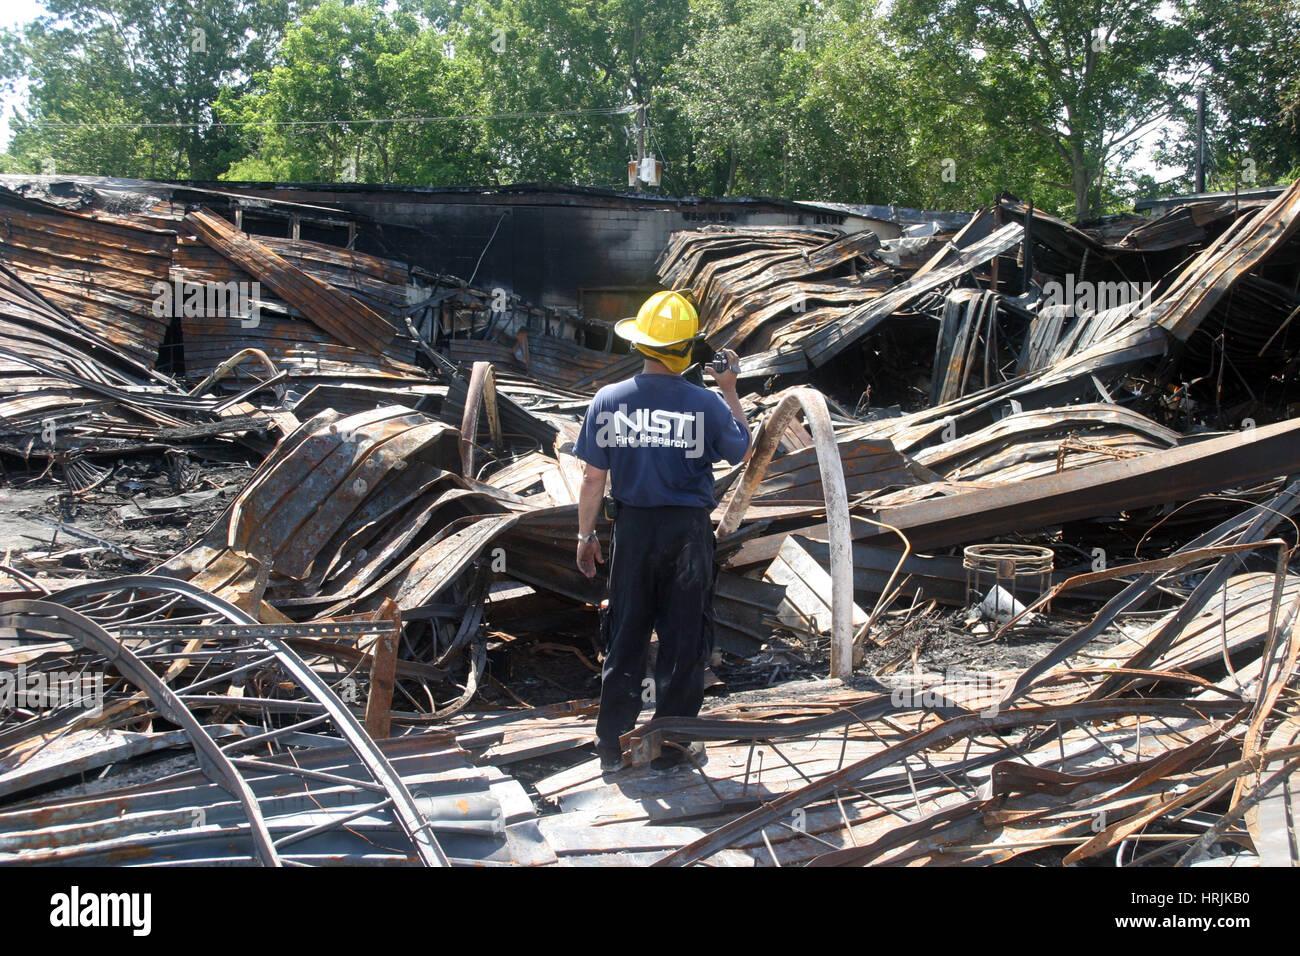 Charleston Sofa Super Store Fire, 2007 - Stock Image